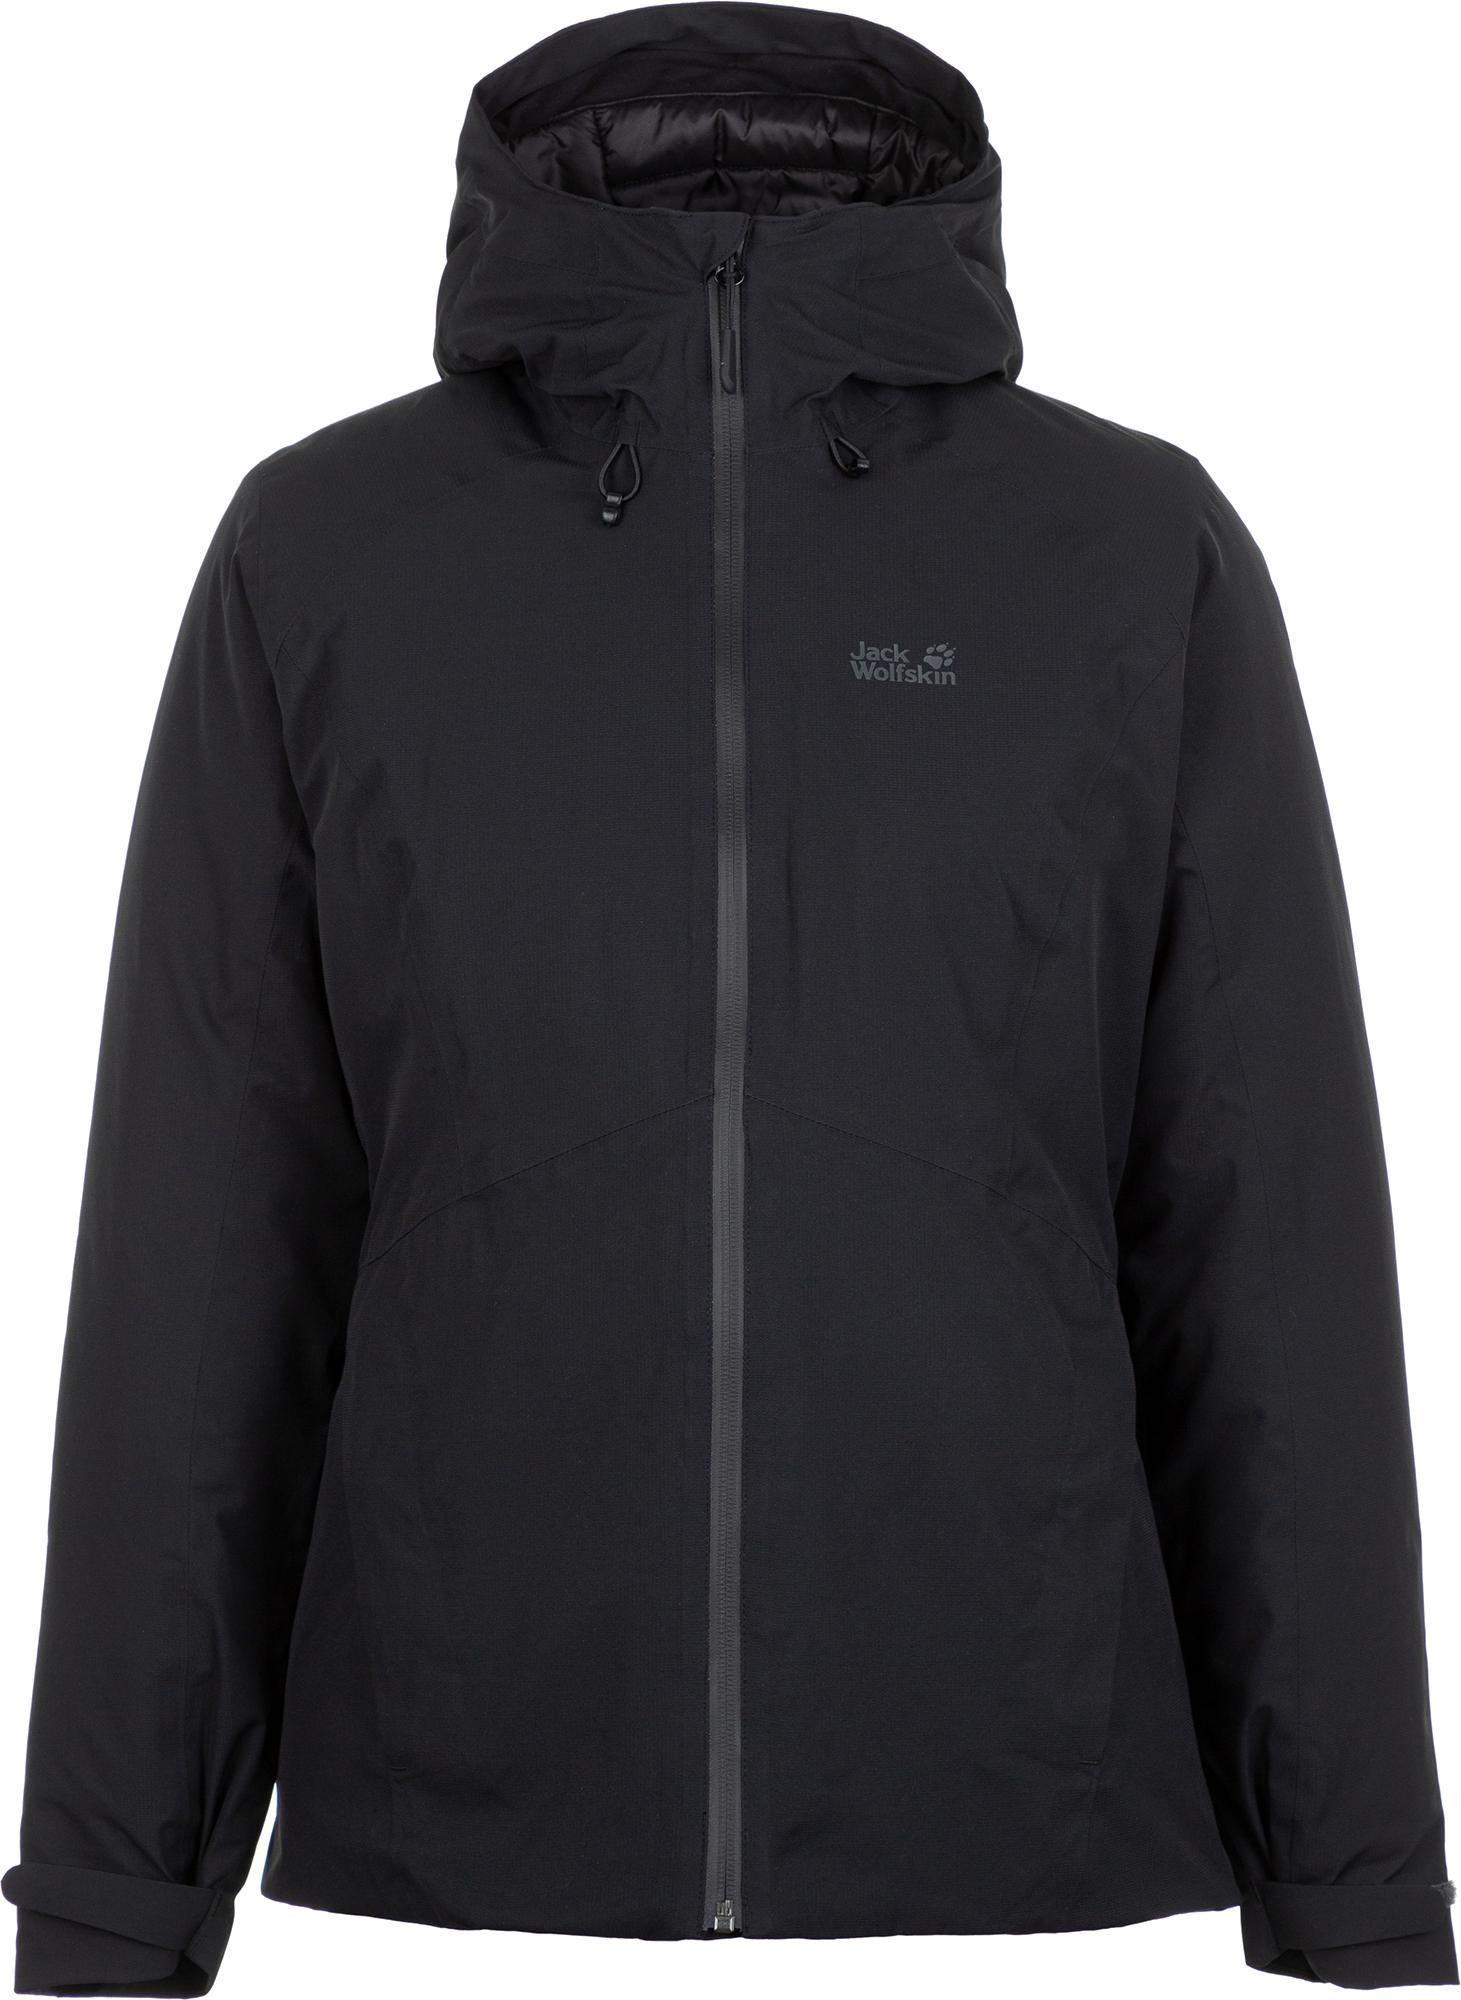 Jack Wolfskin Куртка утепленная женская Argon, размер 52-54